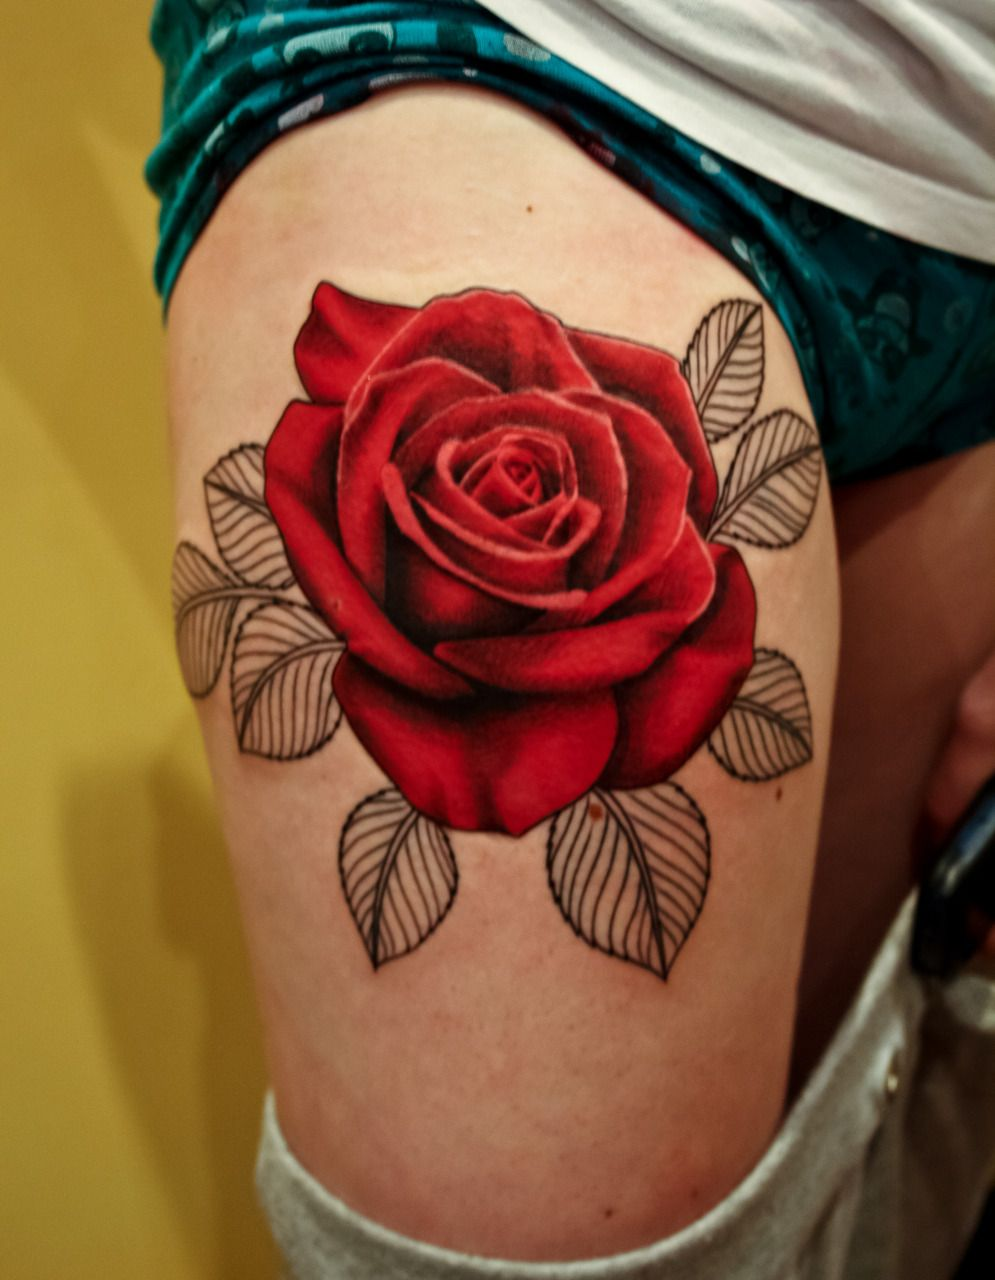 algo asi sigue   **Tattoos!**   Pinterest   Tattoo, Rose and Tatting